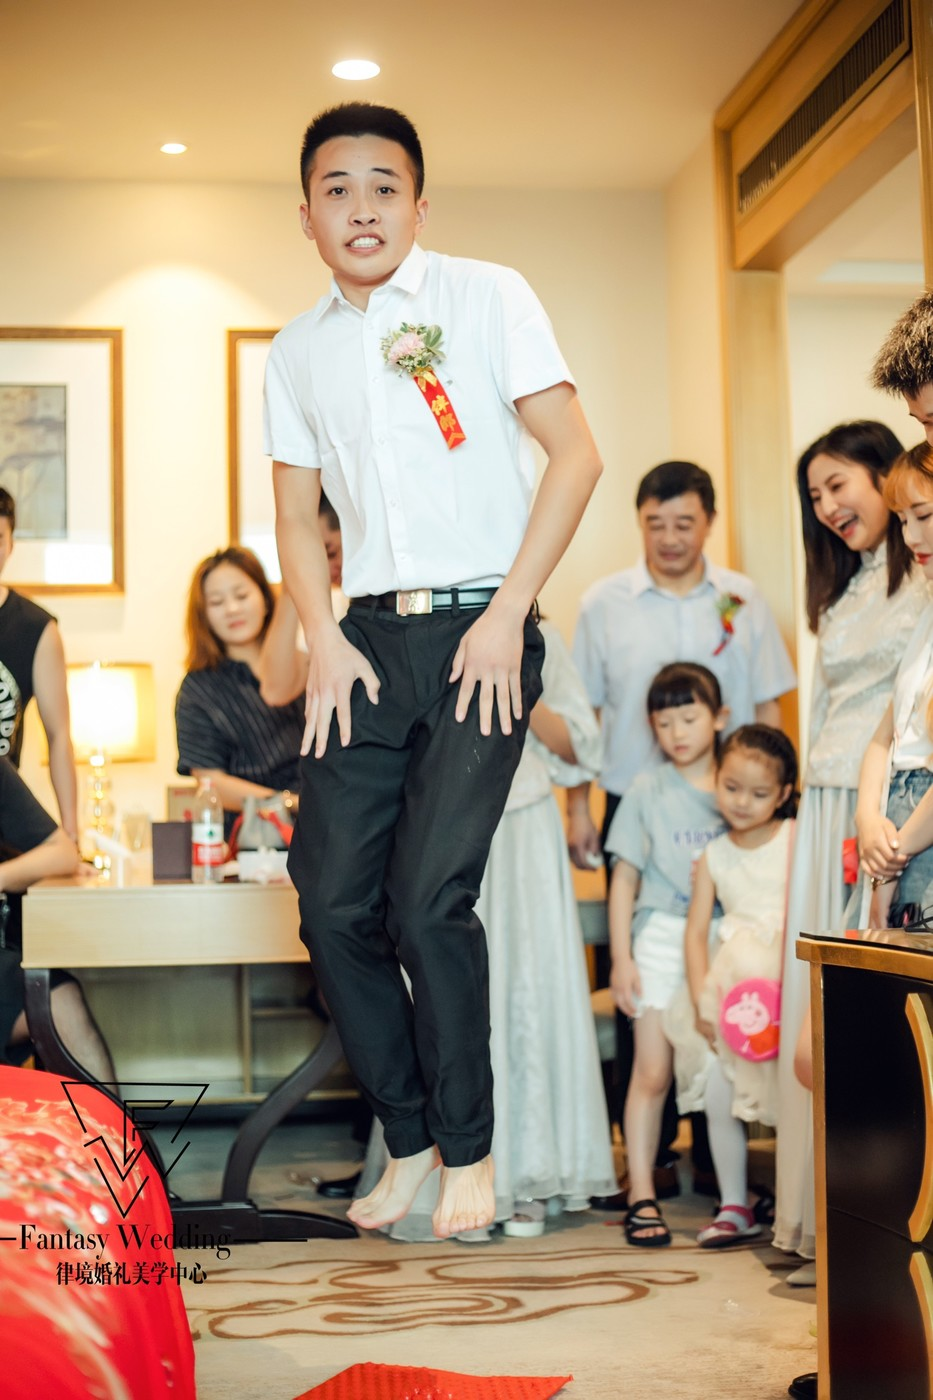 「Fantasy Wedding」&汉式婚礼3